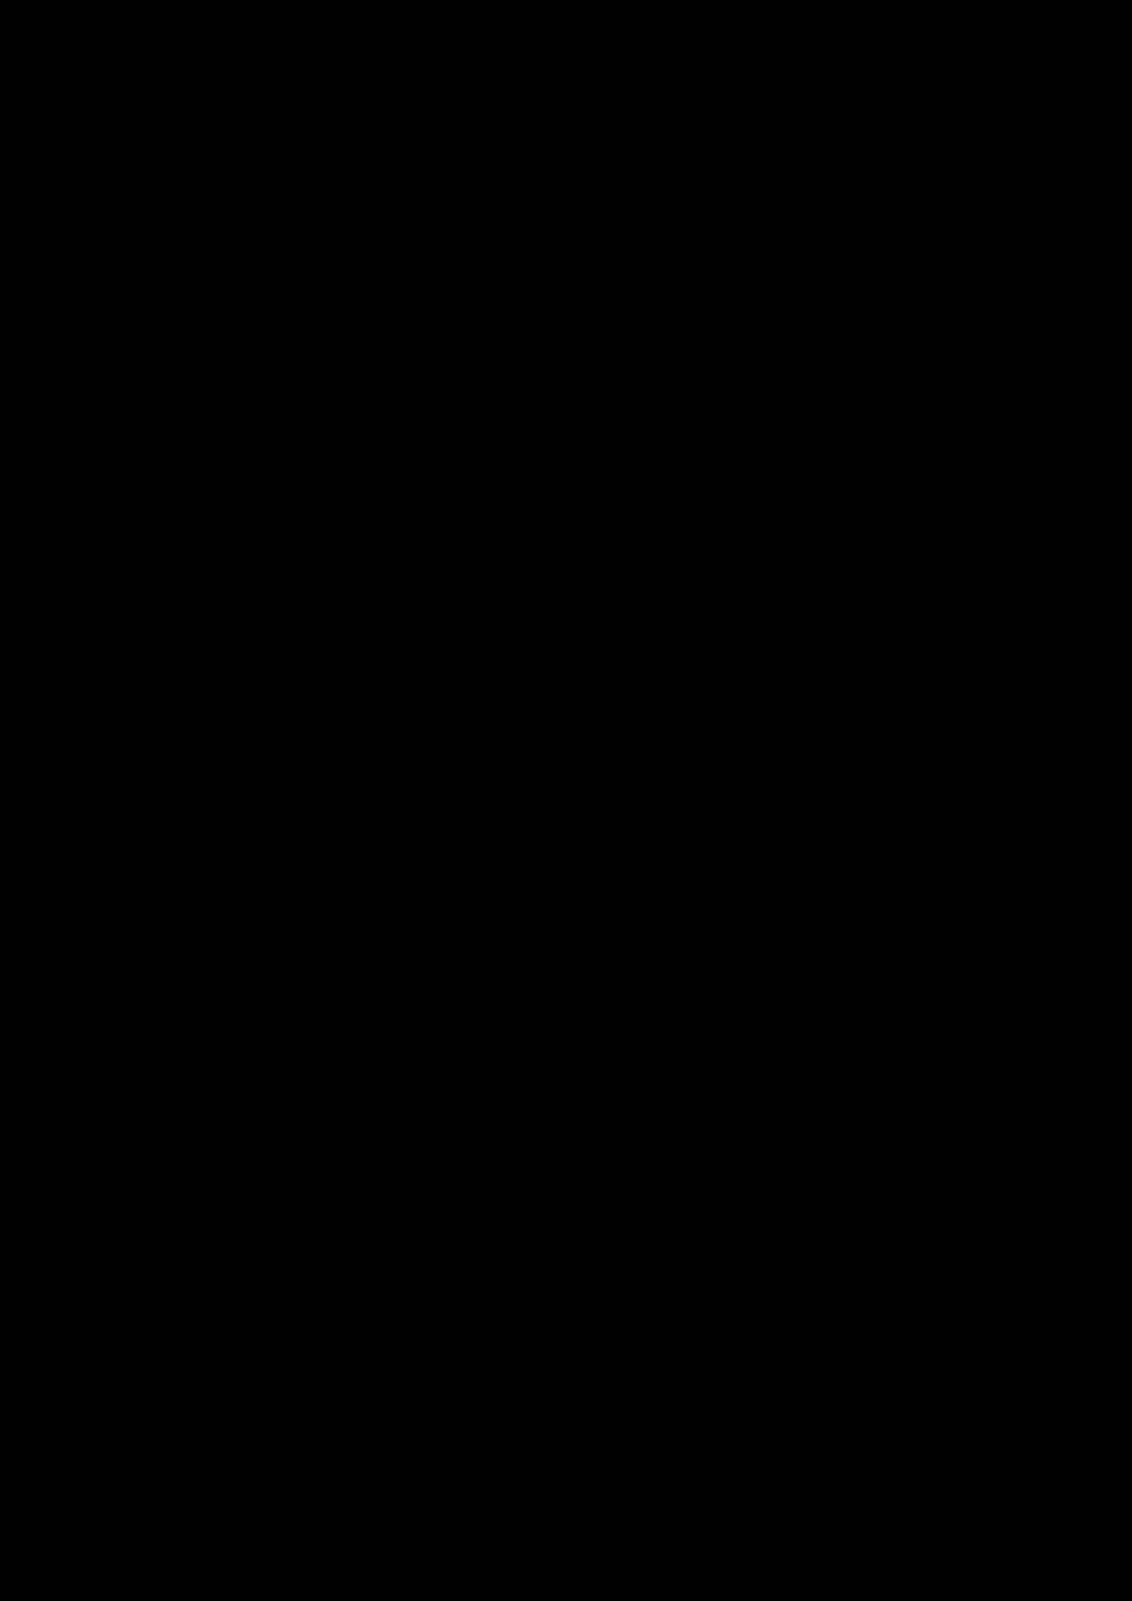 Belyiy sokol slide, Image 162